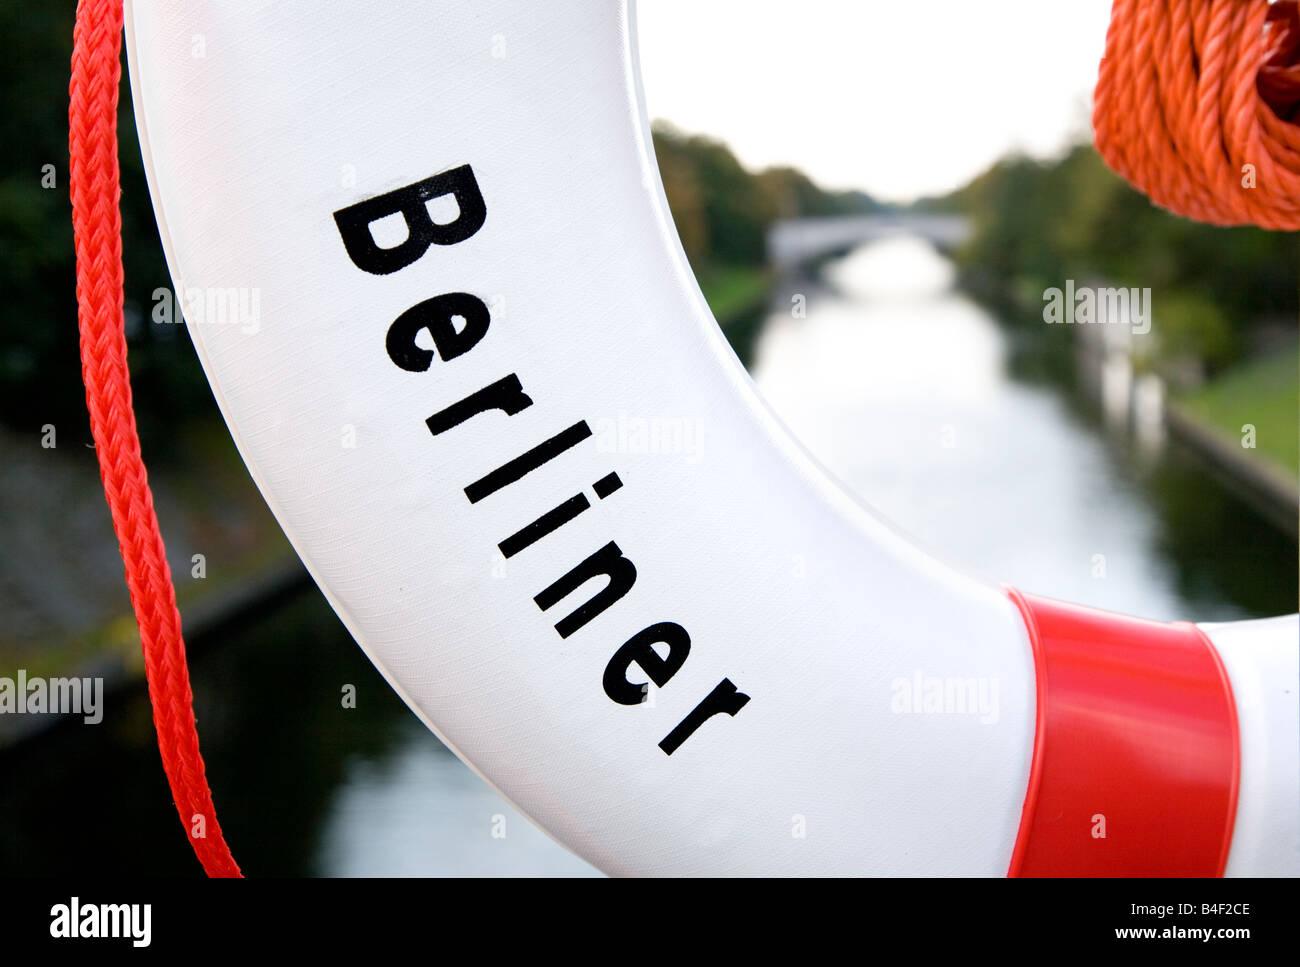 Lifering or Lifebouy with Berliner written on it alongside a Berlin Canal - Stock Image